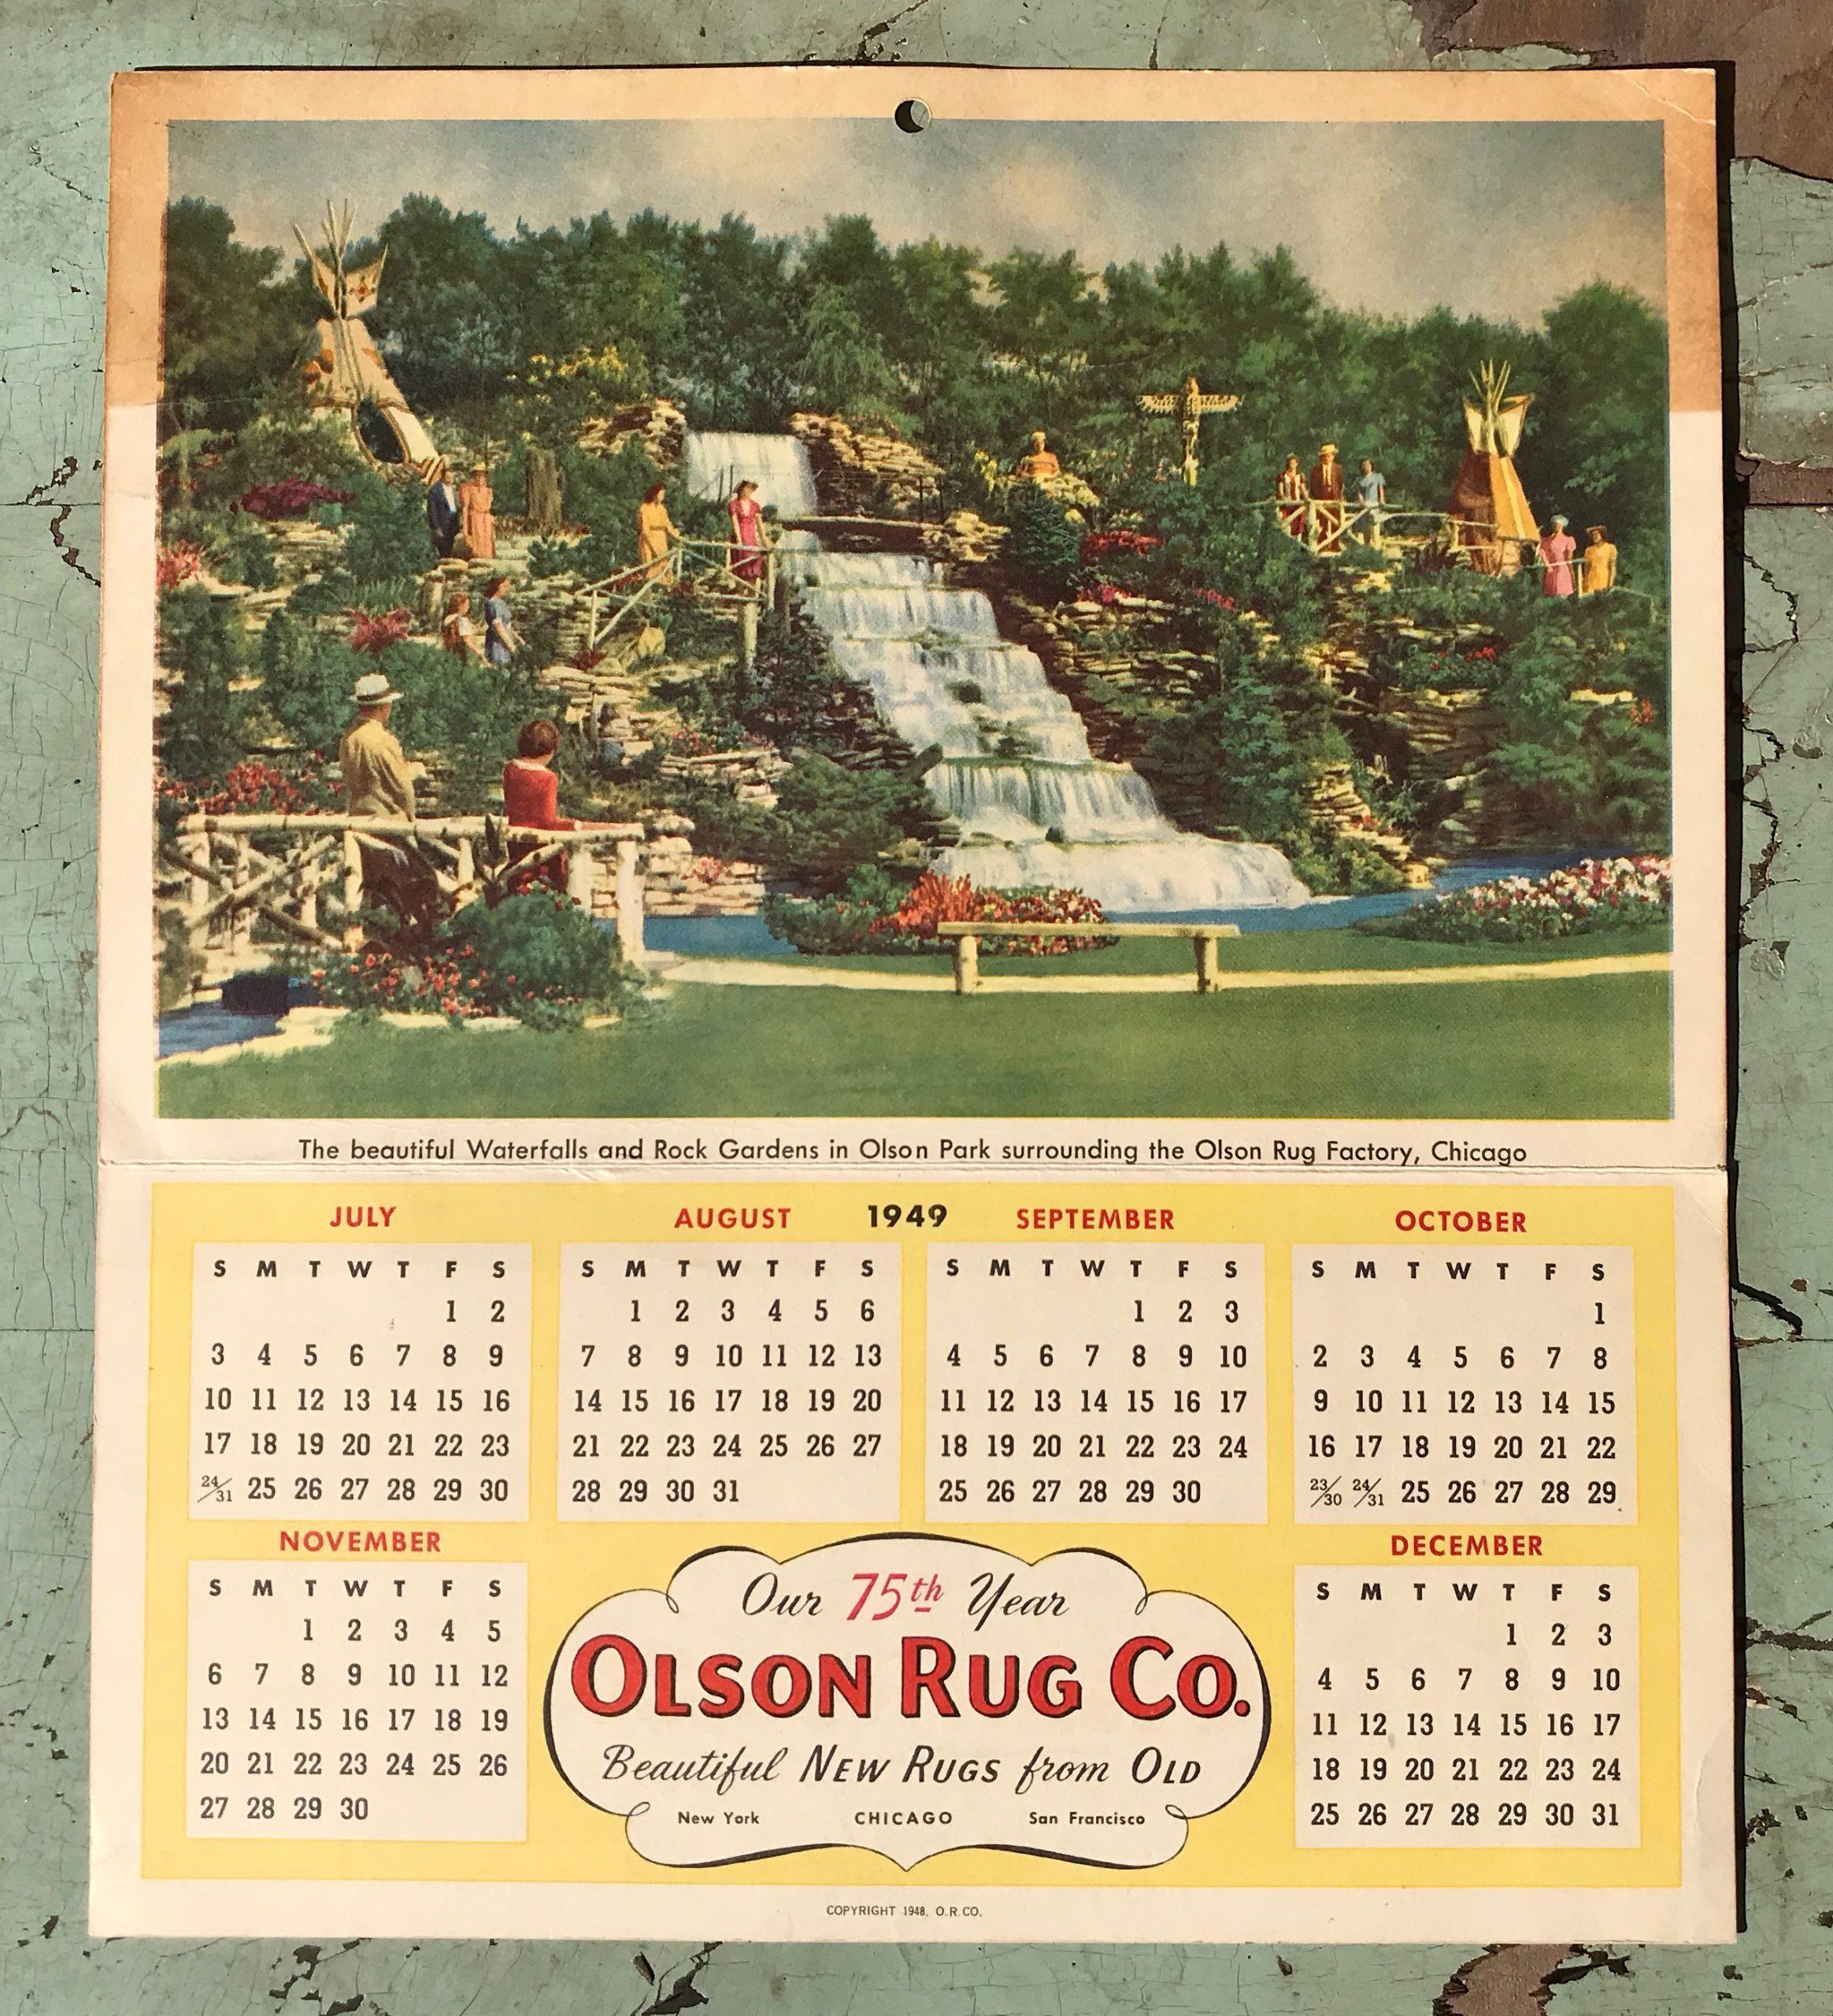 Olson Rug Company, est. 1874